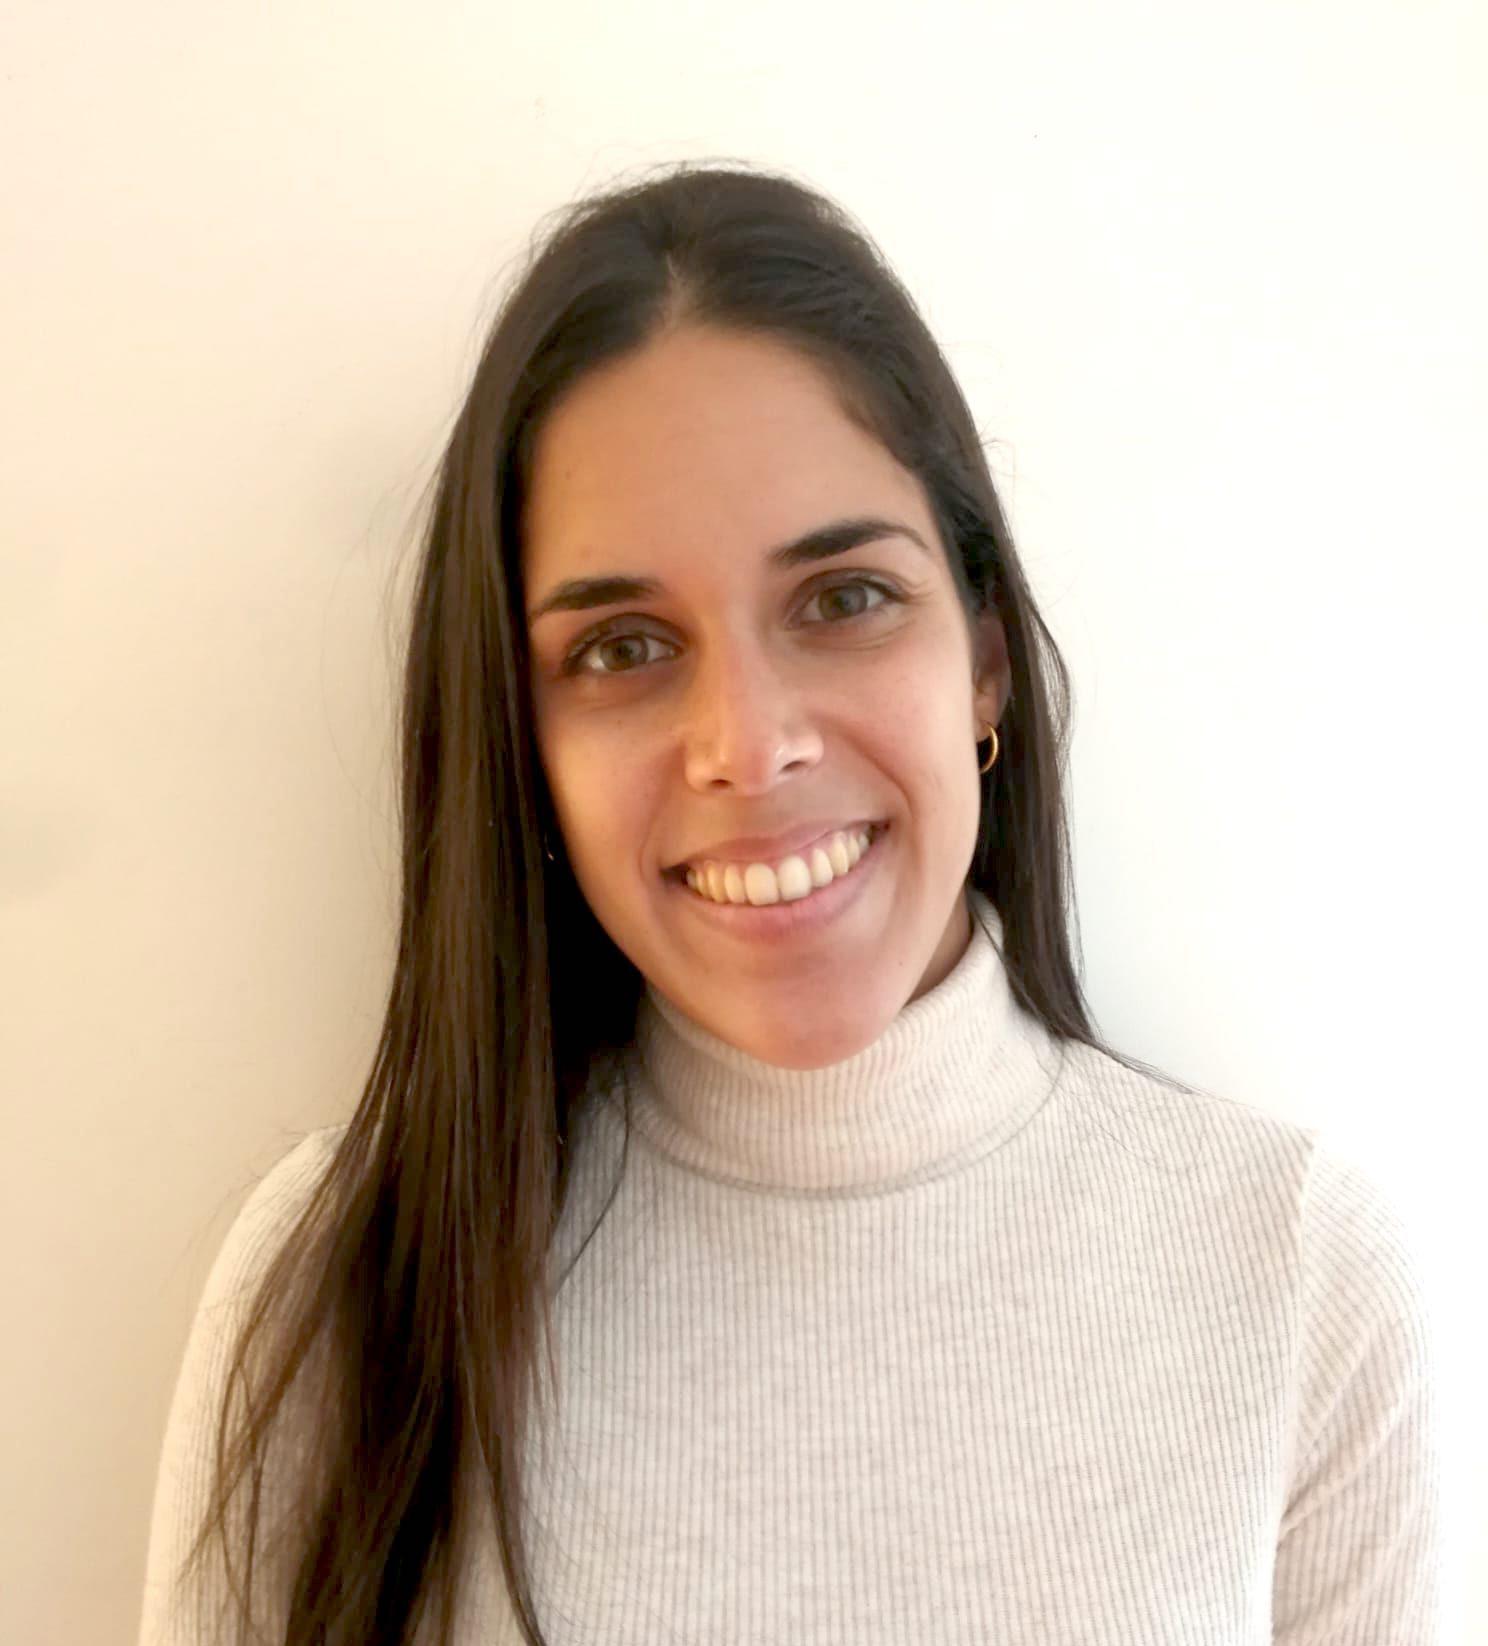 Carmen Pérez Santana